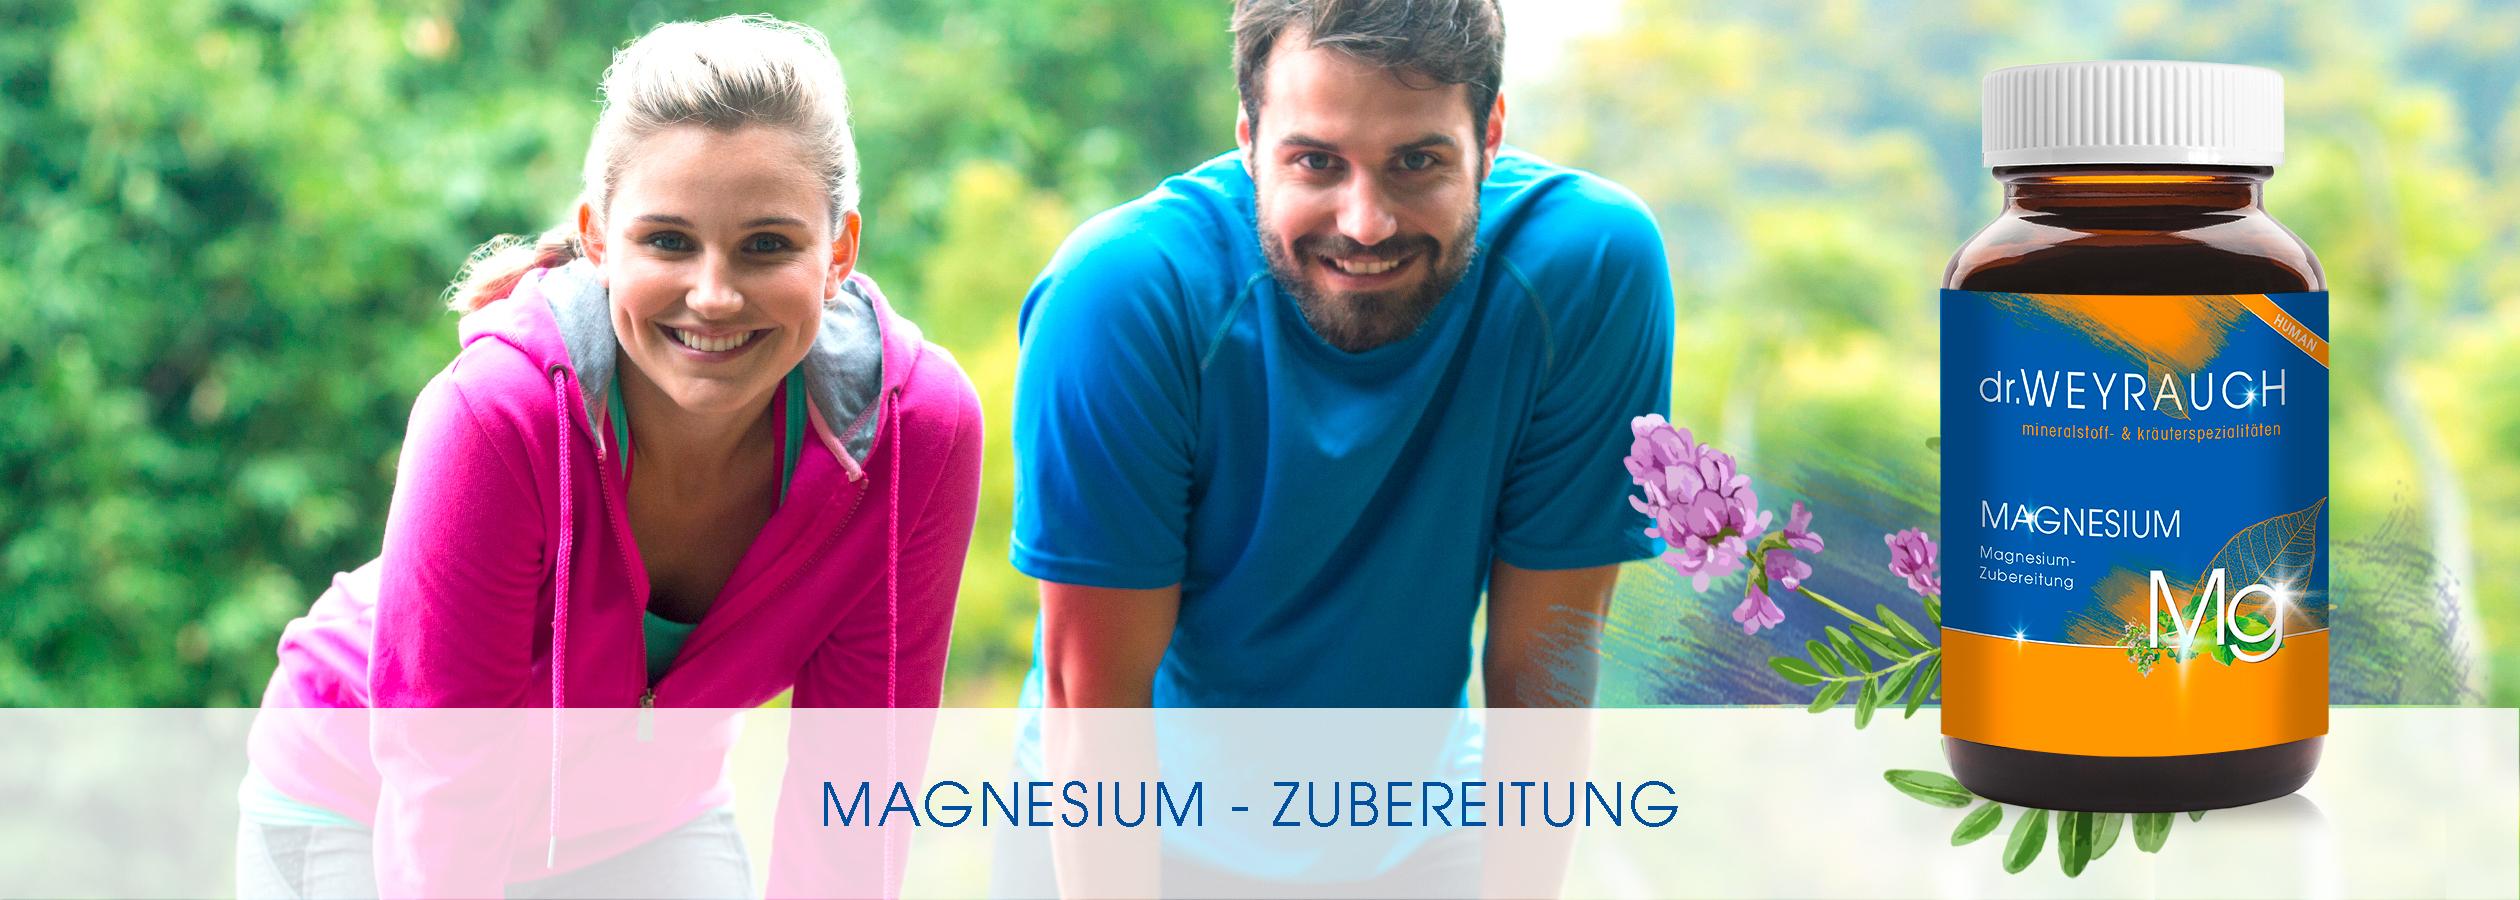 HEADER-2021-Magnesium-HumangMLT6g9x7tnxW